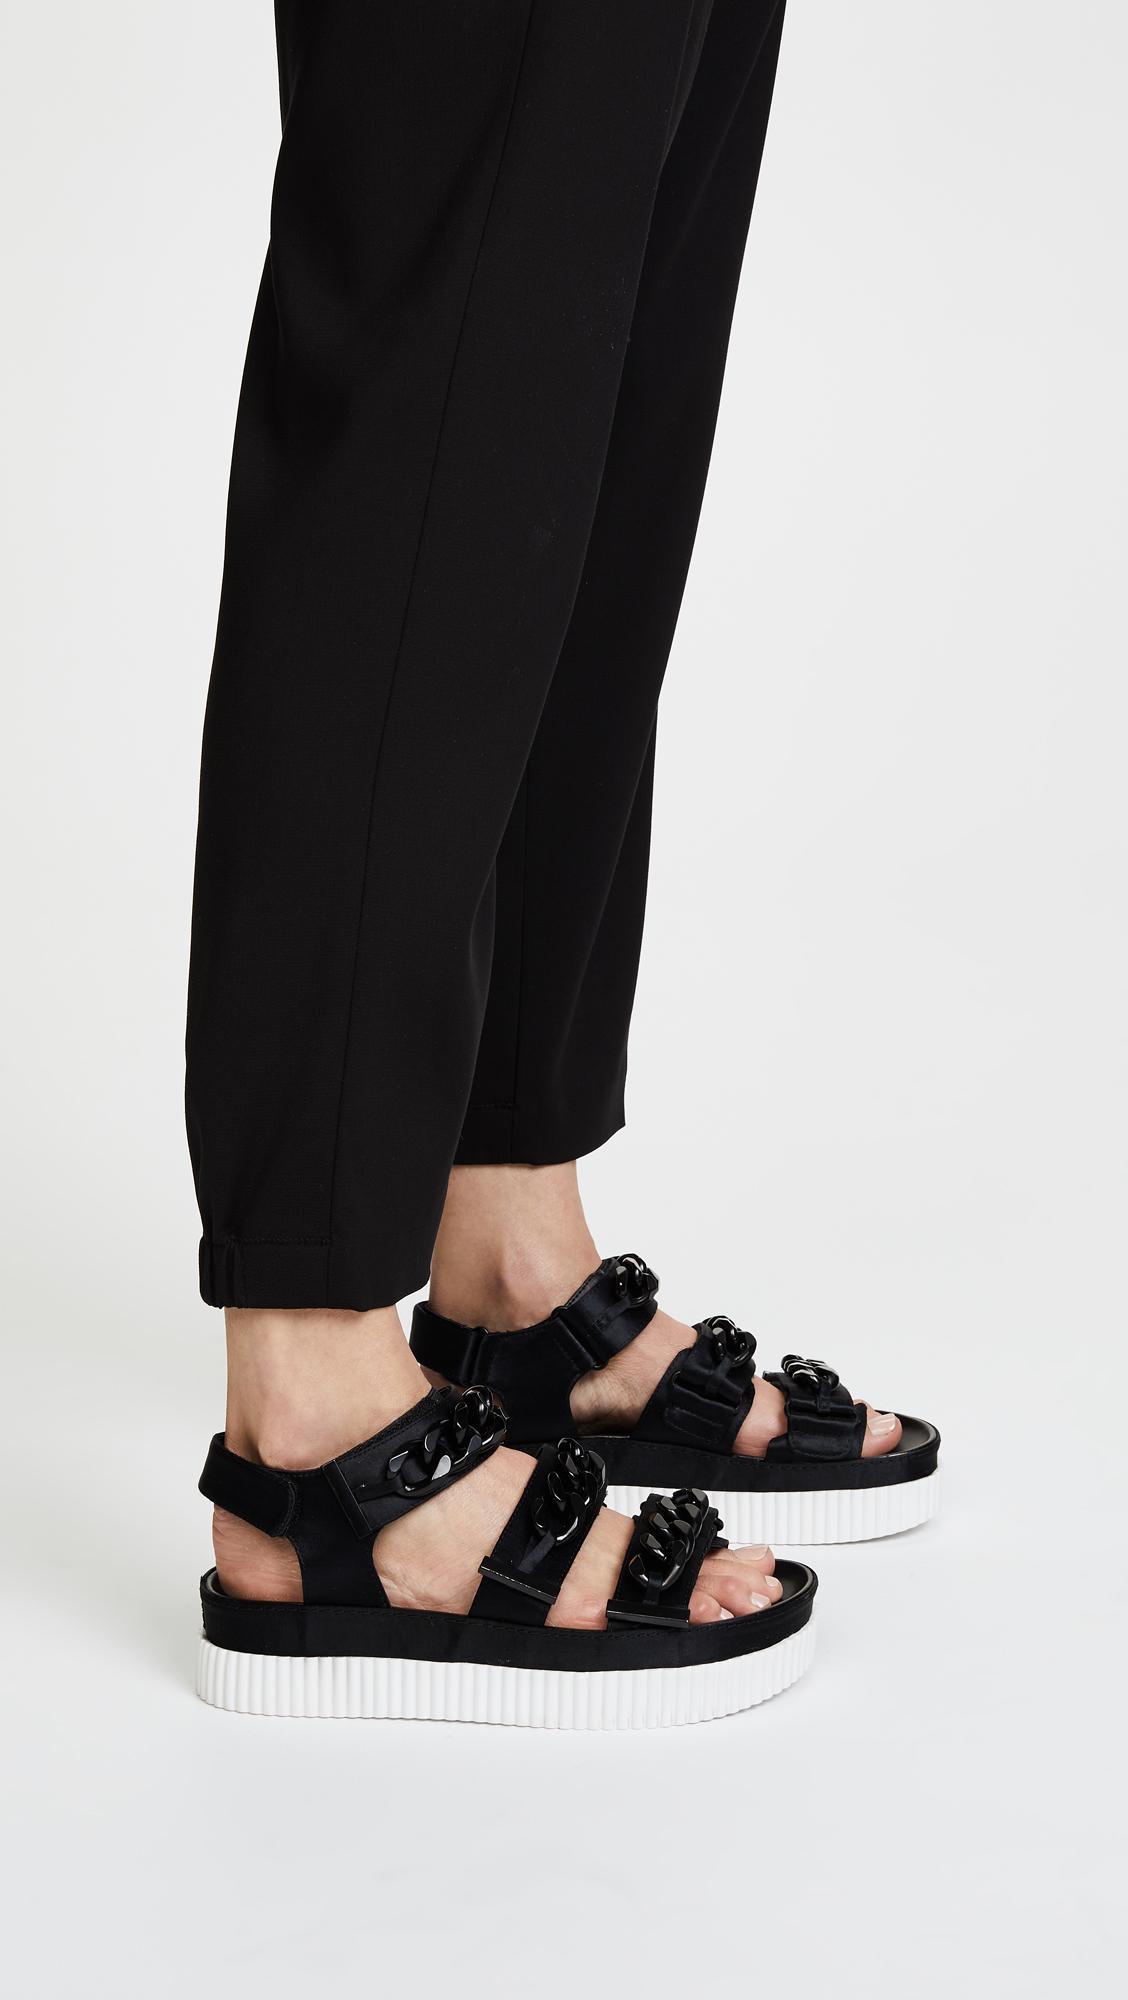 Kendall And Kylie Women's Ivie Satin Chain Platform Sandals L1Ir5U